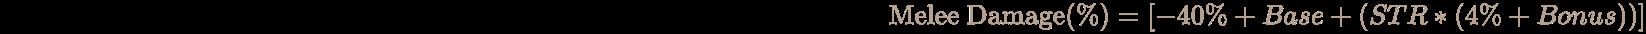 \pagecolor [rgb]{0.058823529411764705,0.058823529411764705,0.058823529411764705}\color [rgb]{0.7058823529411765,0.6274509803921569,0.5490196078431373}{\text{Melee Damage}}(\%)=[-40\%+Base+(STR*(4\%+Bonus))]